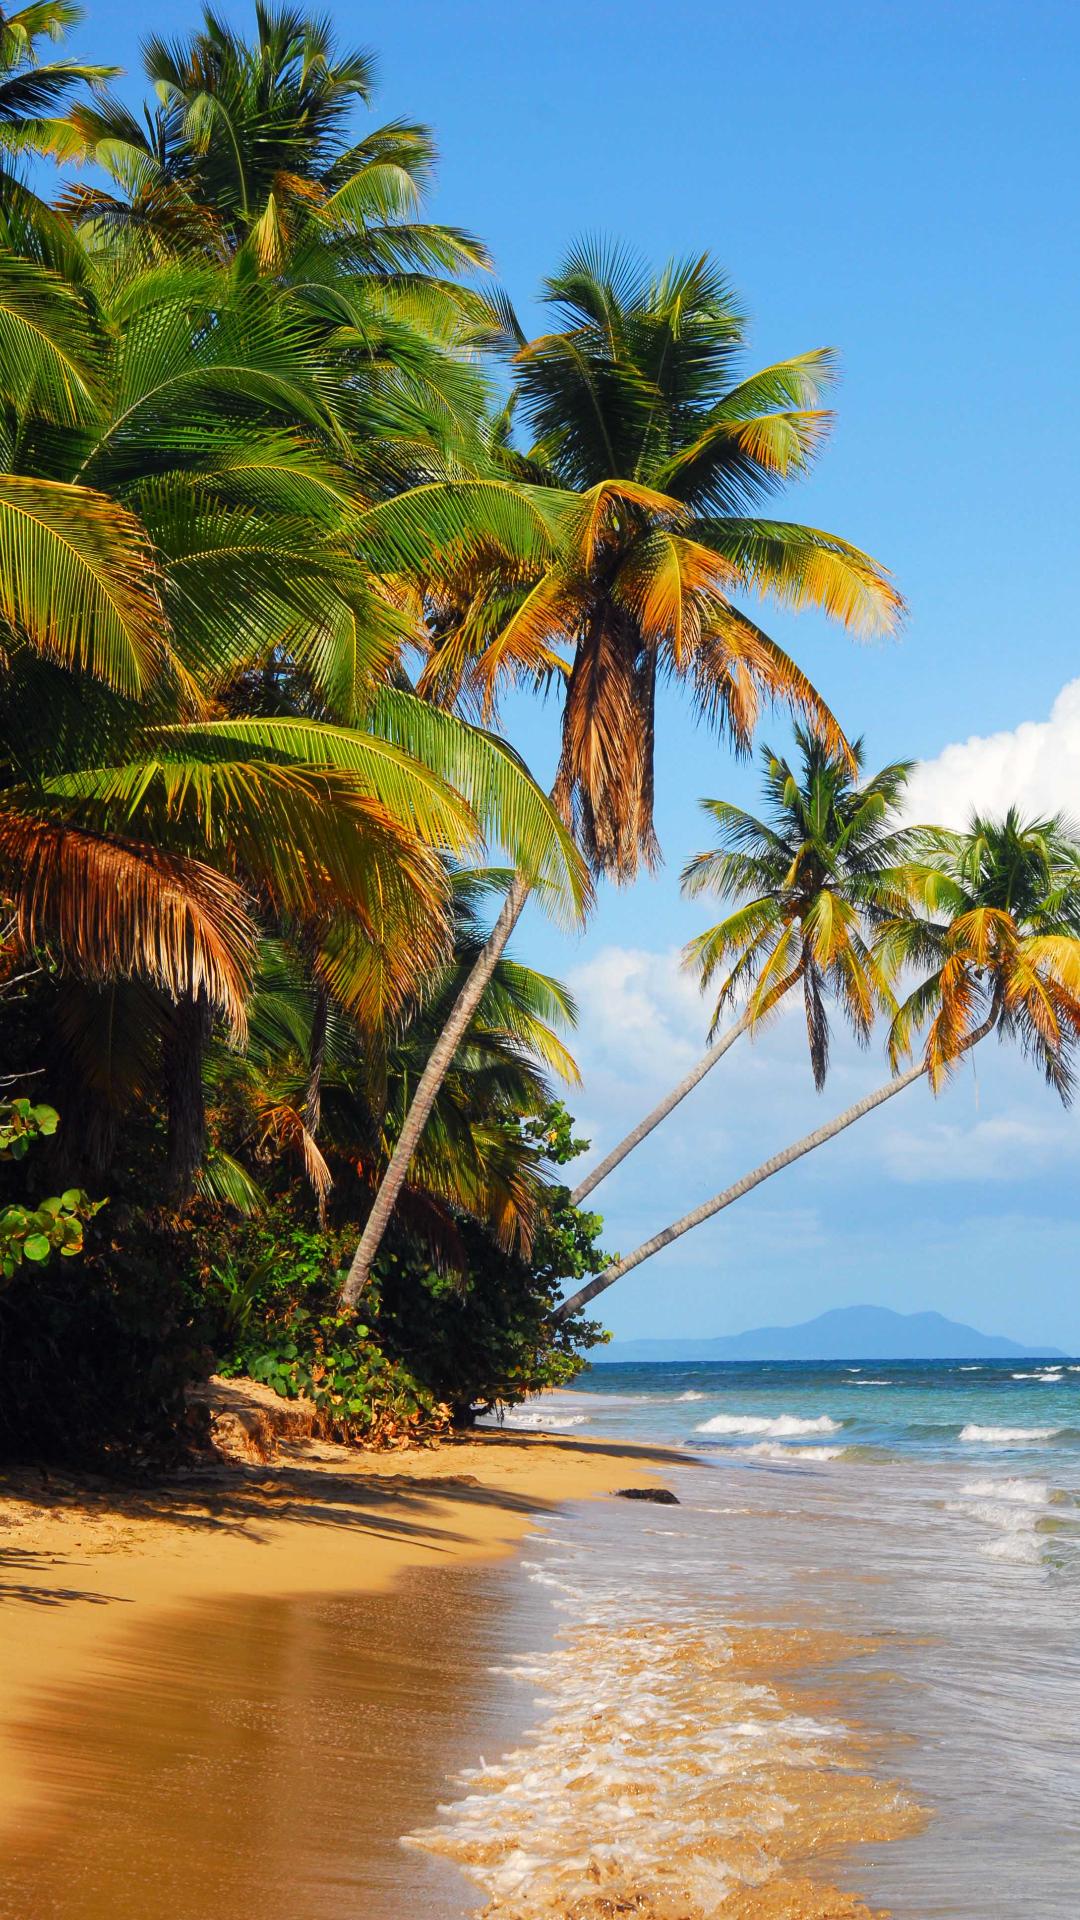 Puerto Rico Beach Iphone 6 Plus Wallpaper 1080x1920 Beautiful Landscapes Nature Photography Beach Landscape